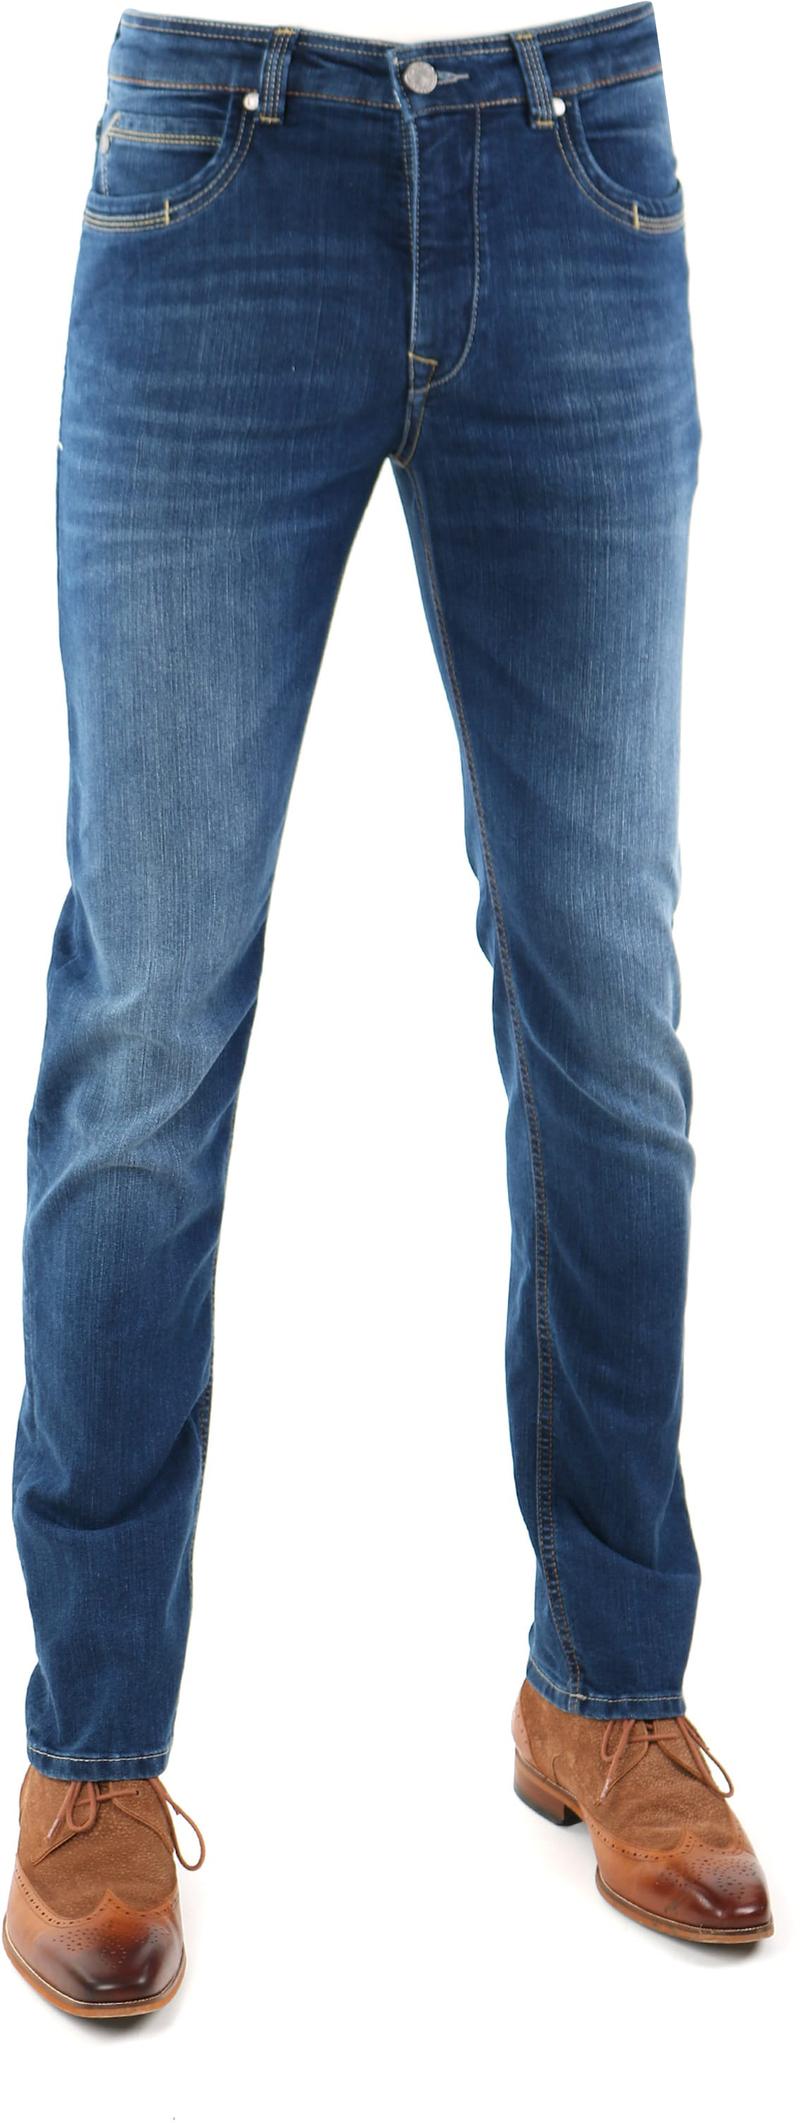 Gardeur Batu Stretch Jeans Blue photo 0